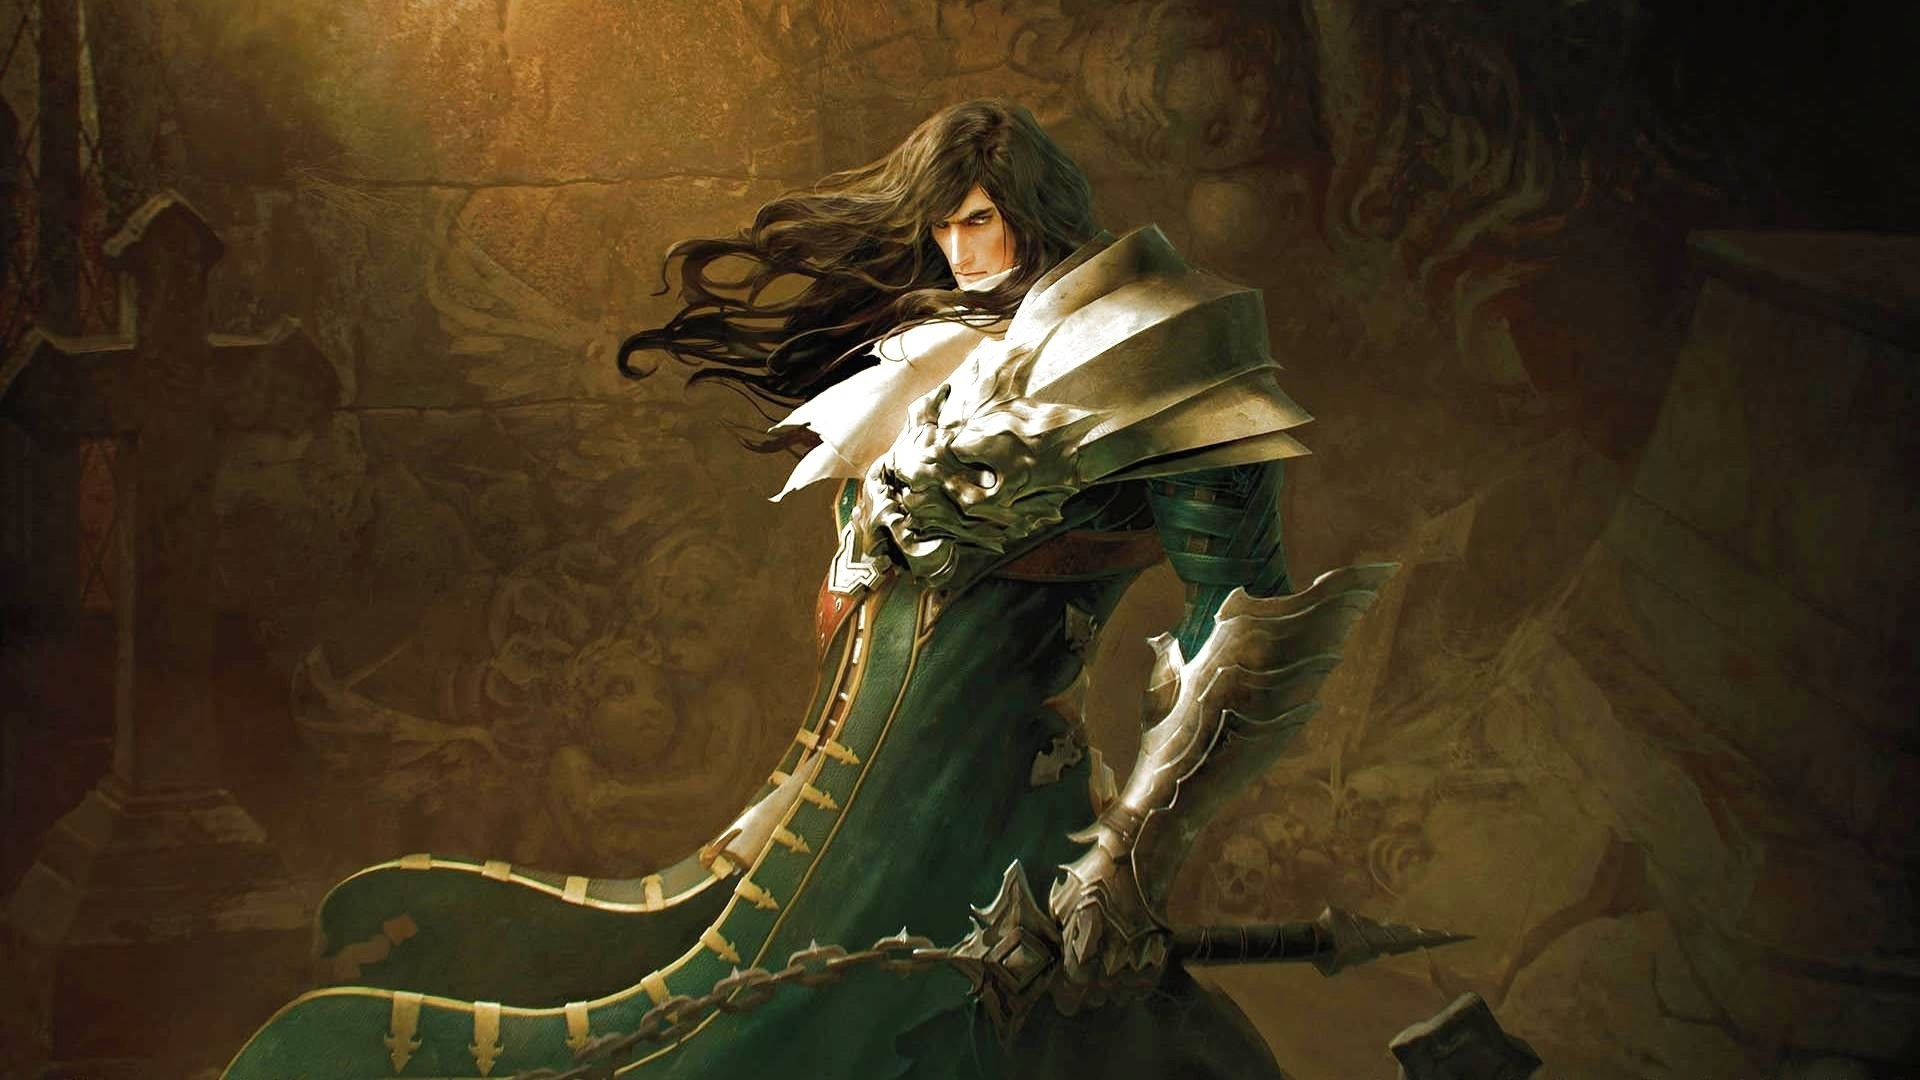 Res: 1920x1080, horror, evil, digital drawings,castlevania, fantasy, warrior, fantasy,